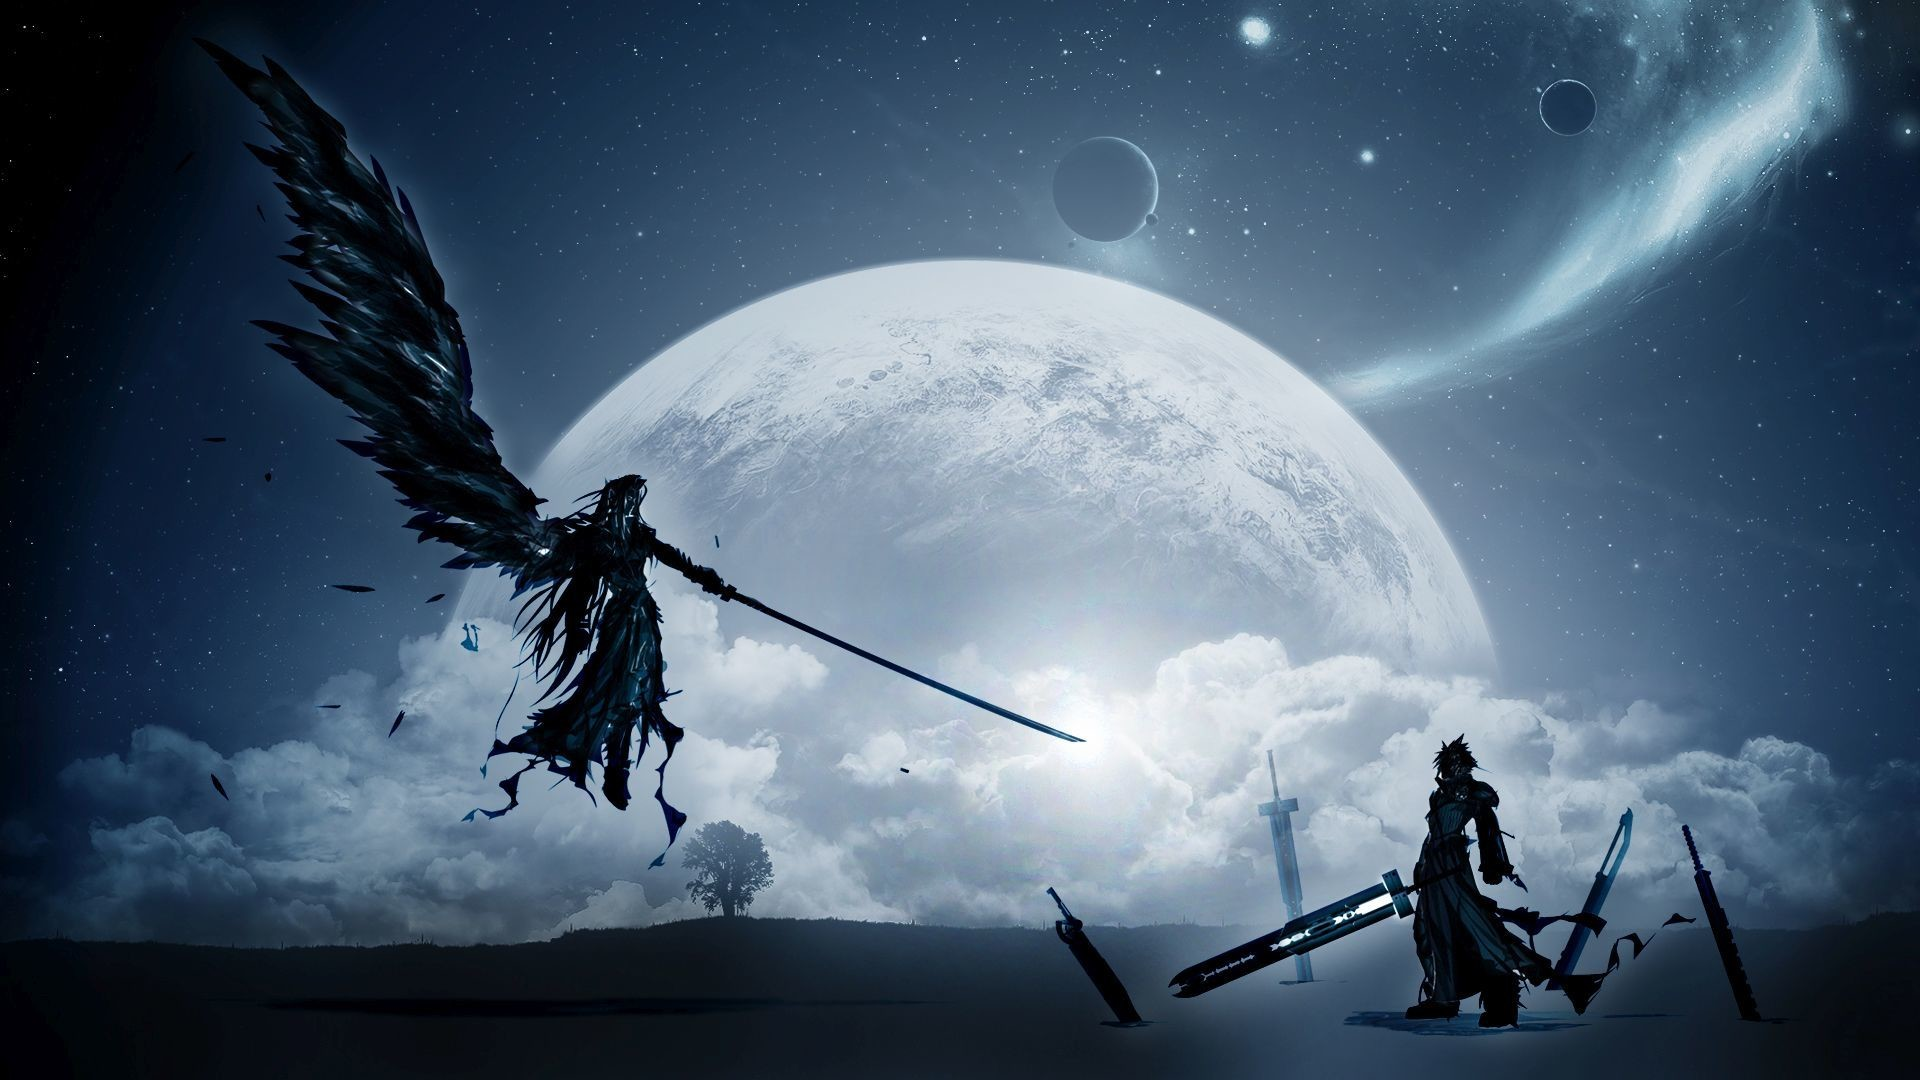 Final Fantasy VII HD Wallpaper 1920×1080